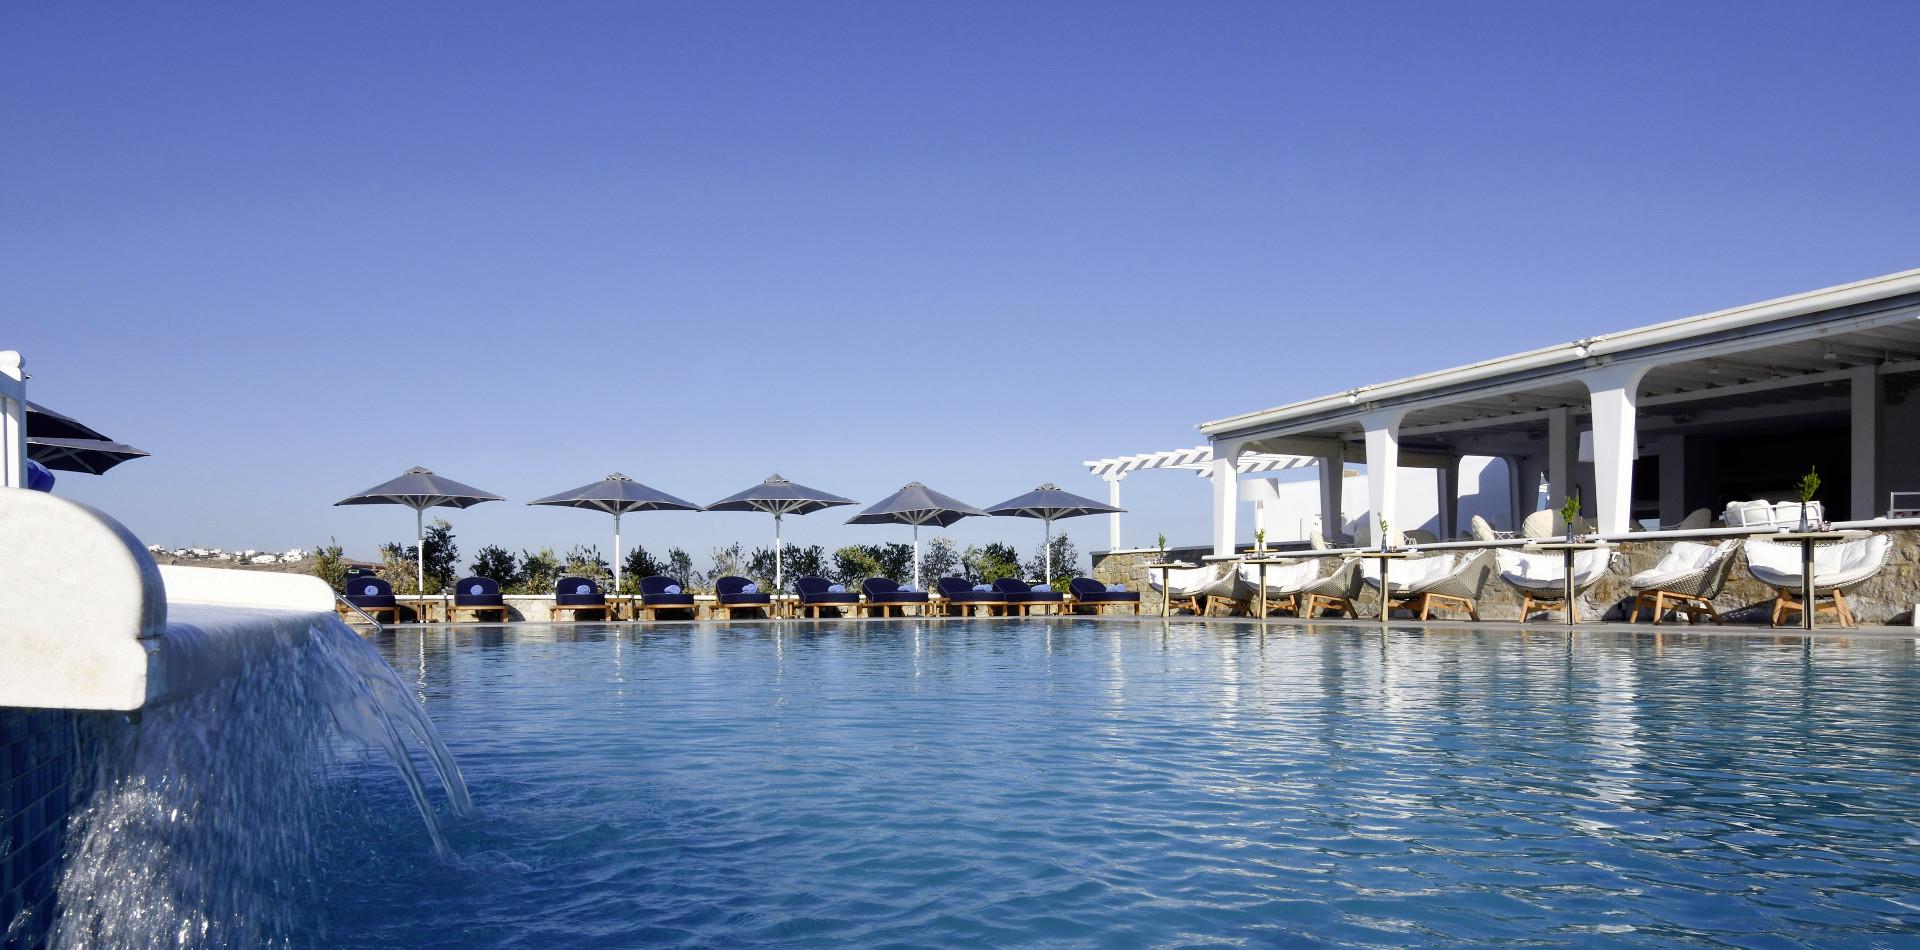 Luxushotel auf Mykonos - Myconian Kyma Design Hotel